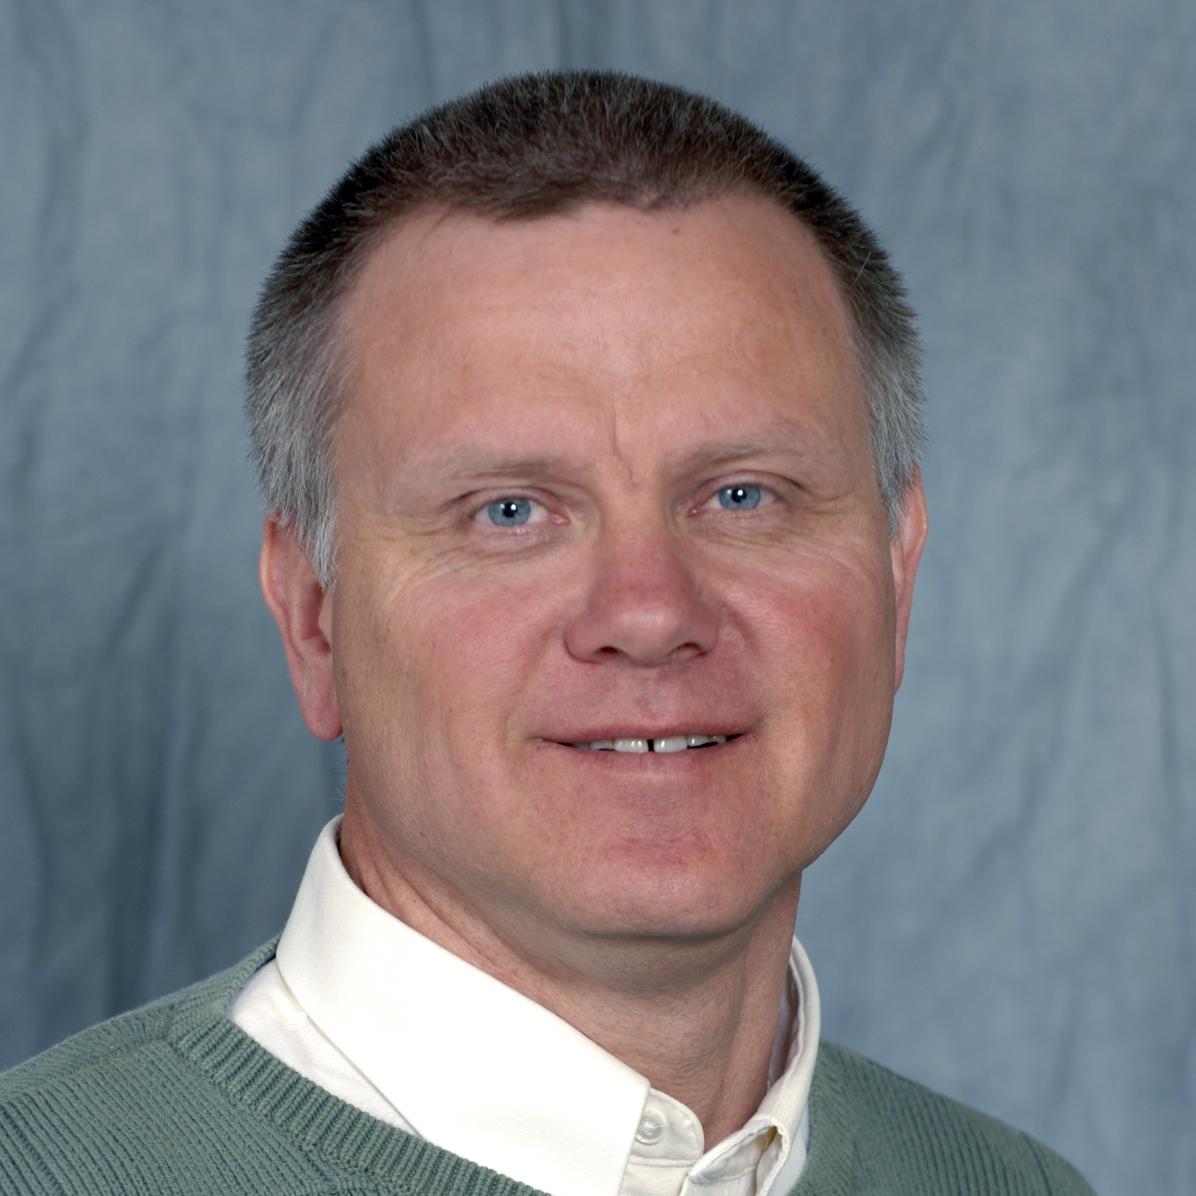 Dave Gosselin portrait